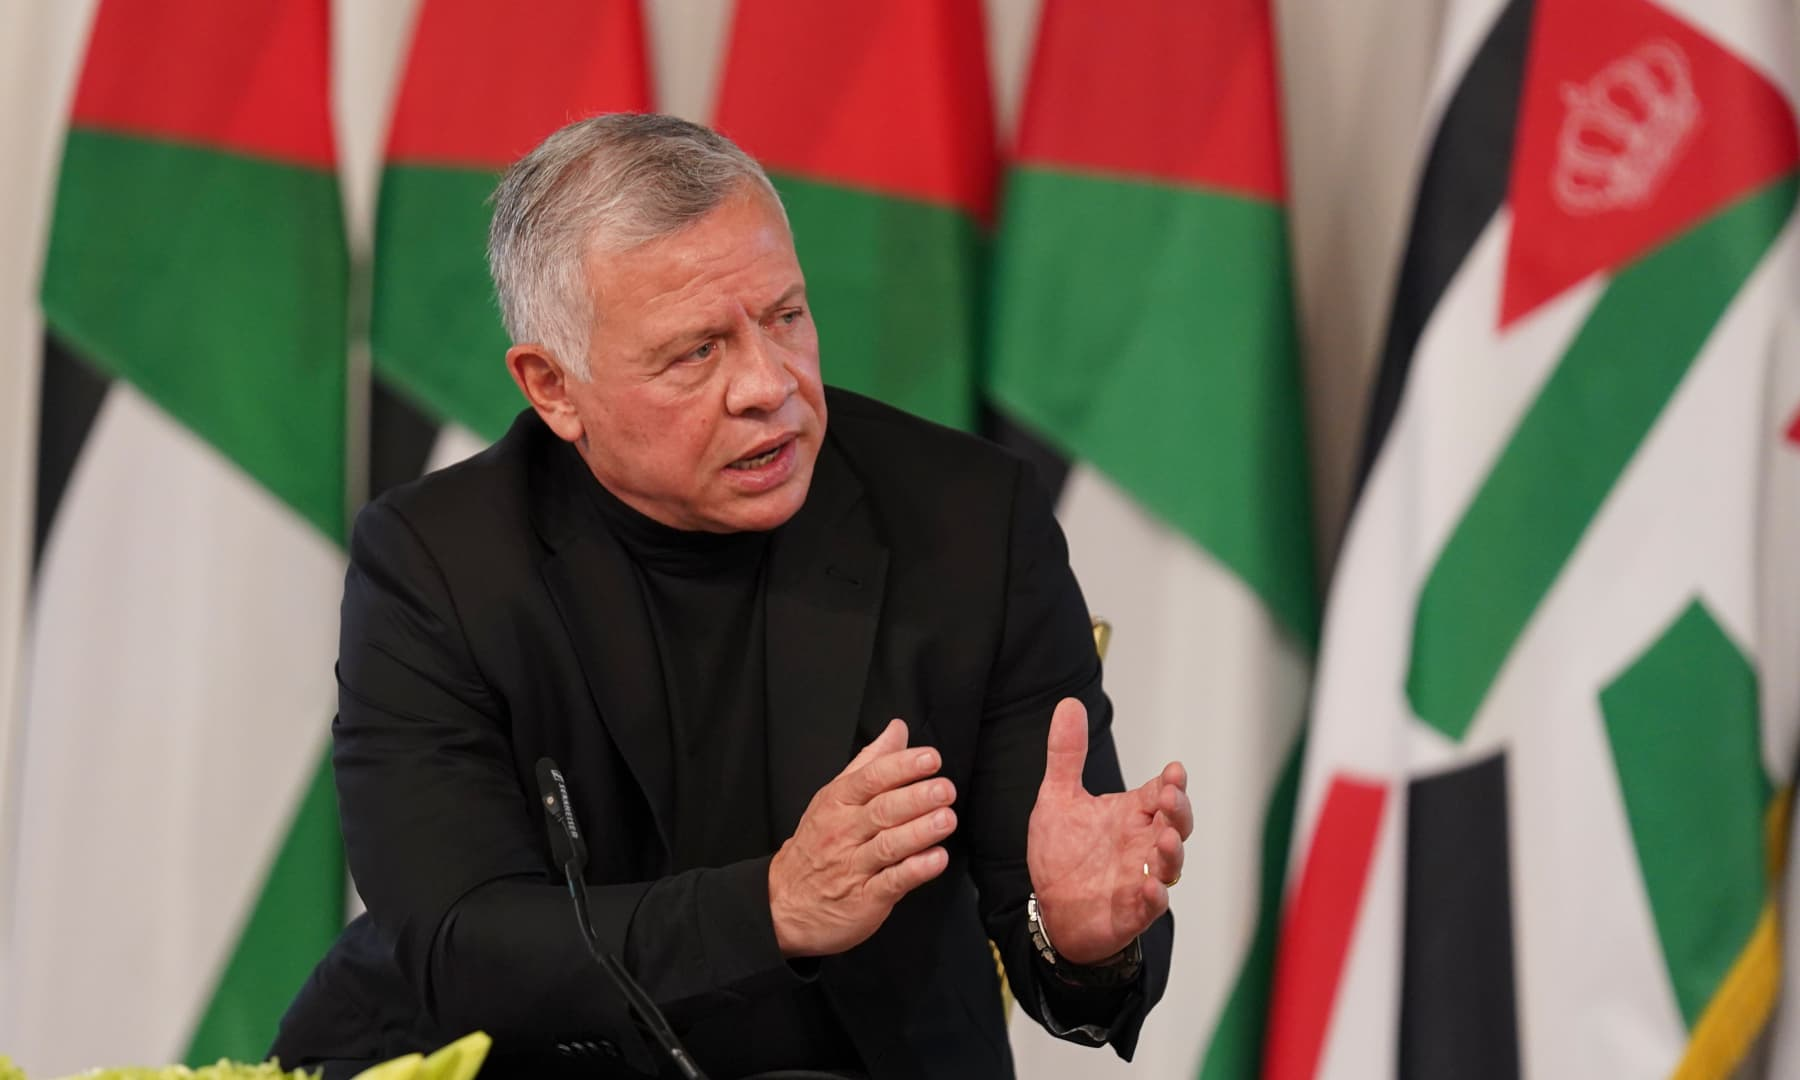 Jordan's King Abdullah II speaks during a meeting with a tribal leader in Al Qasta, south of Amman, Jordan on October 4, 2021. — AP